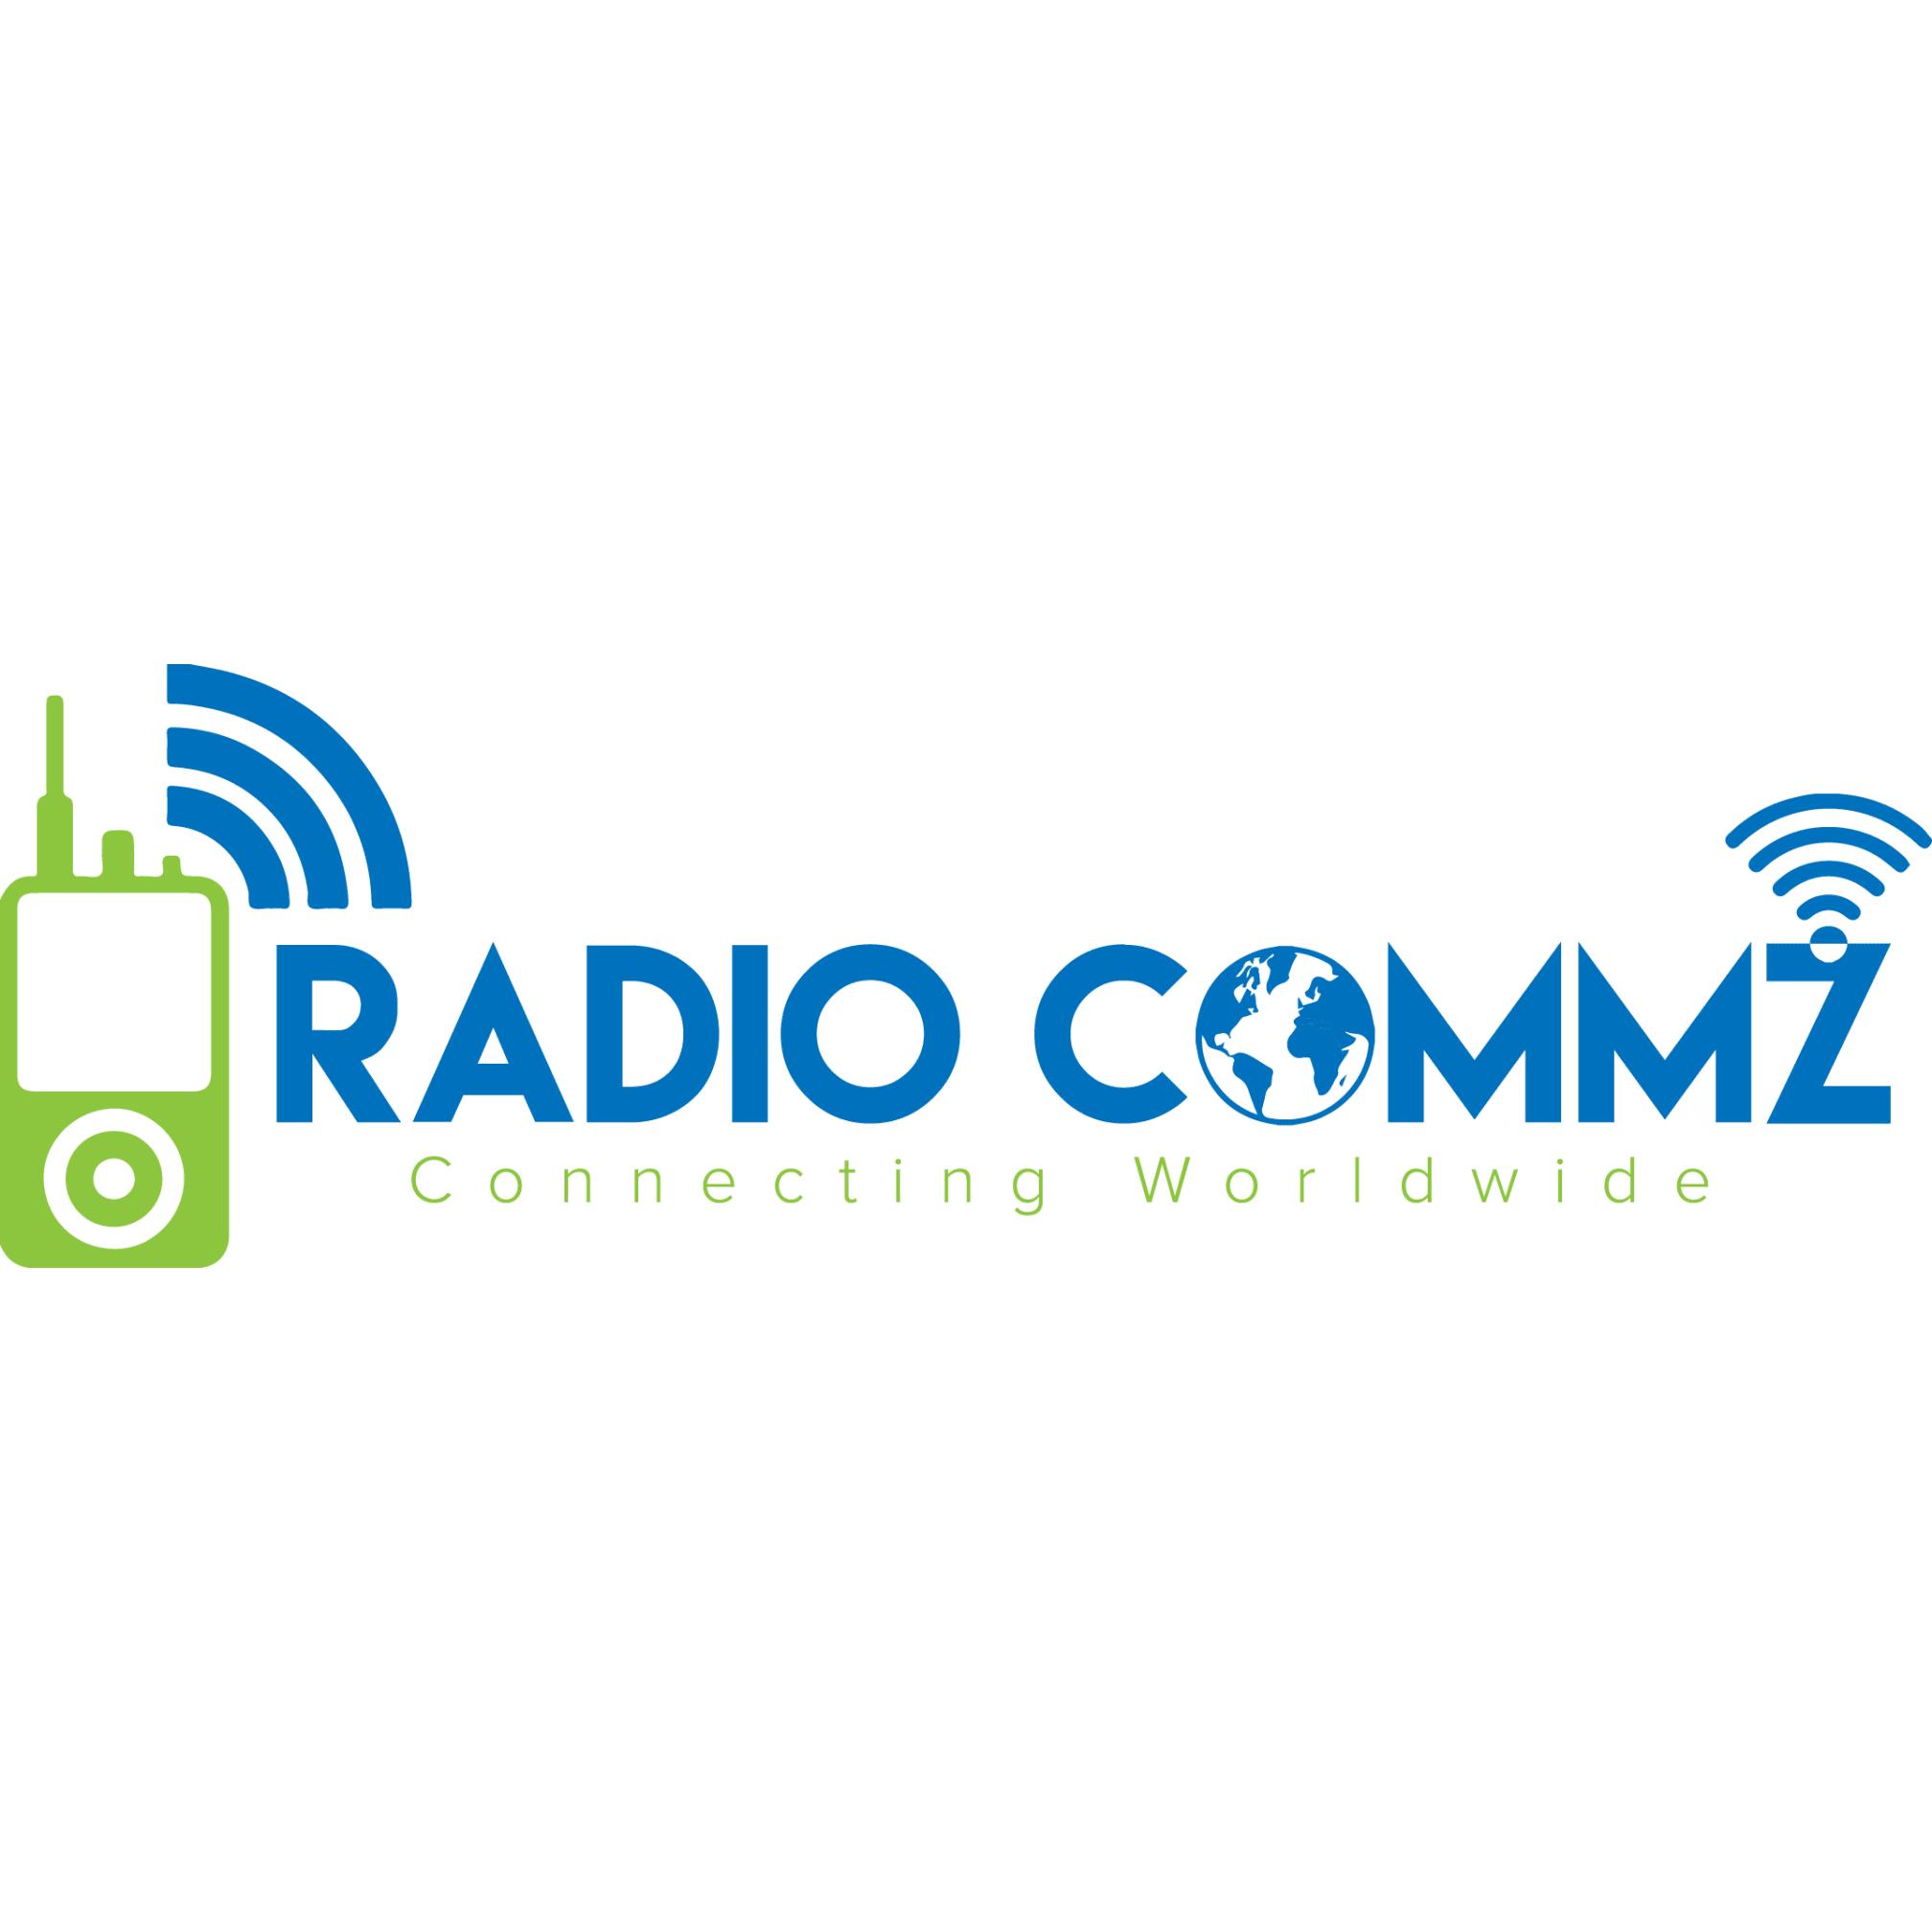 Radio Commz UK Ltd - Jarrow, Tyne and Wear NE32 3HG - 08006 893702 | ShowMeLocal.com